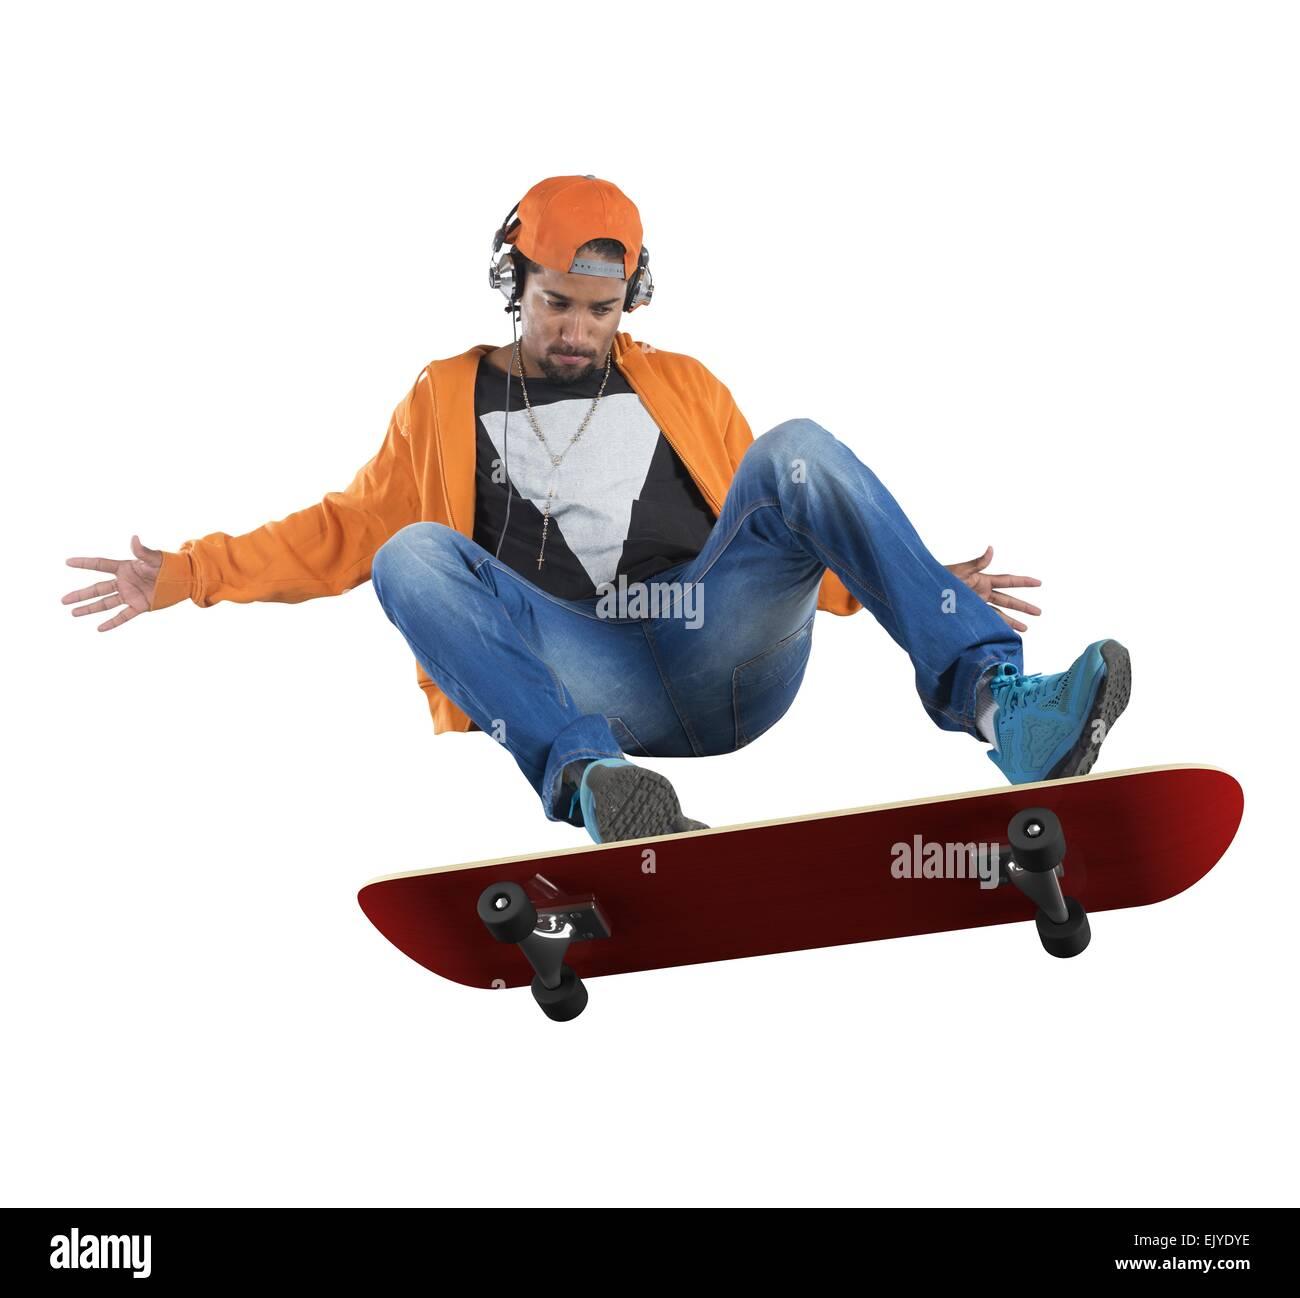 Skate stunts - Stock Image